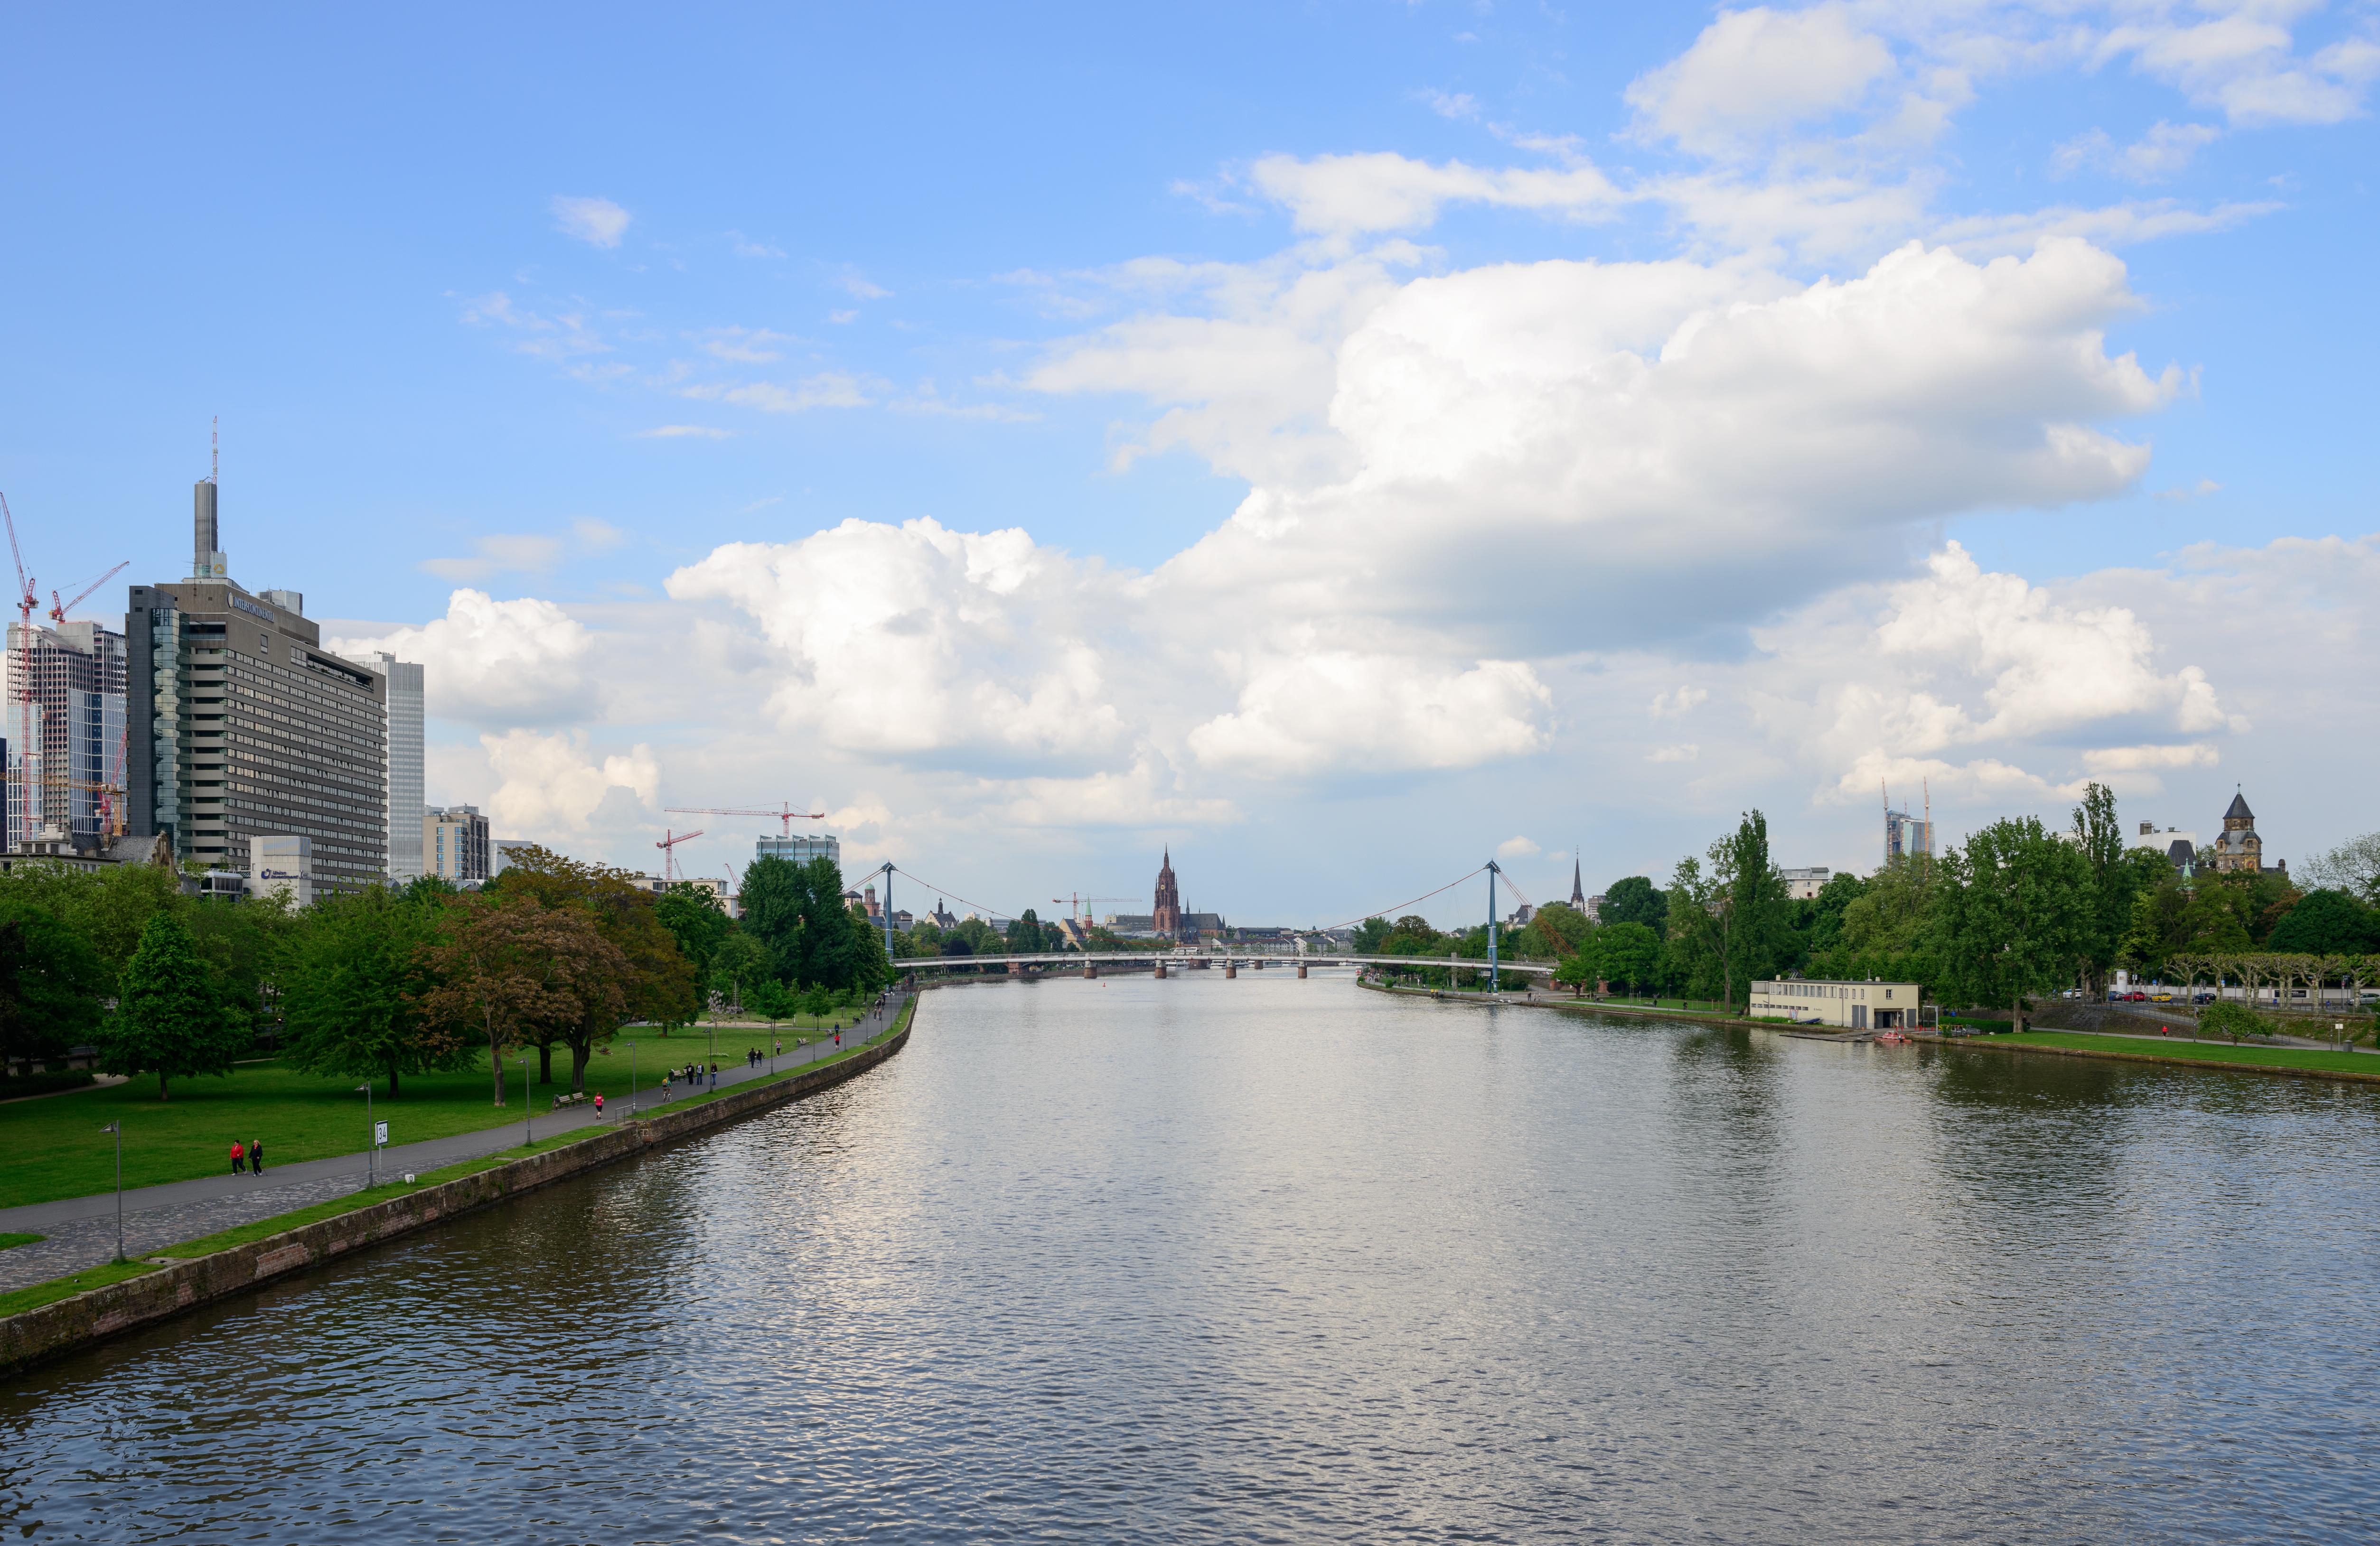 FileRiver Main At Frankfurt Main Germanyjpg Wikimedia Commons - Frankfurt river